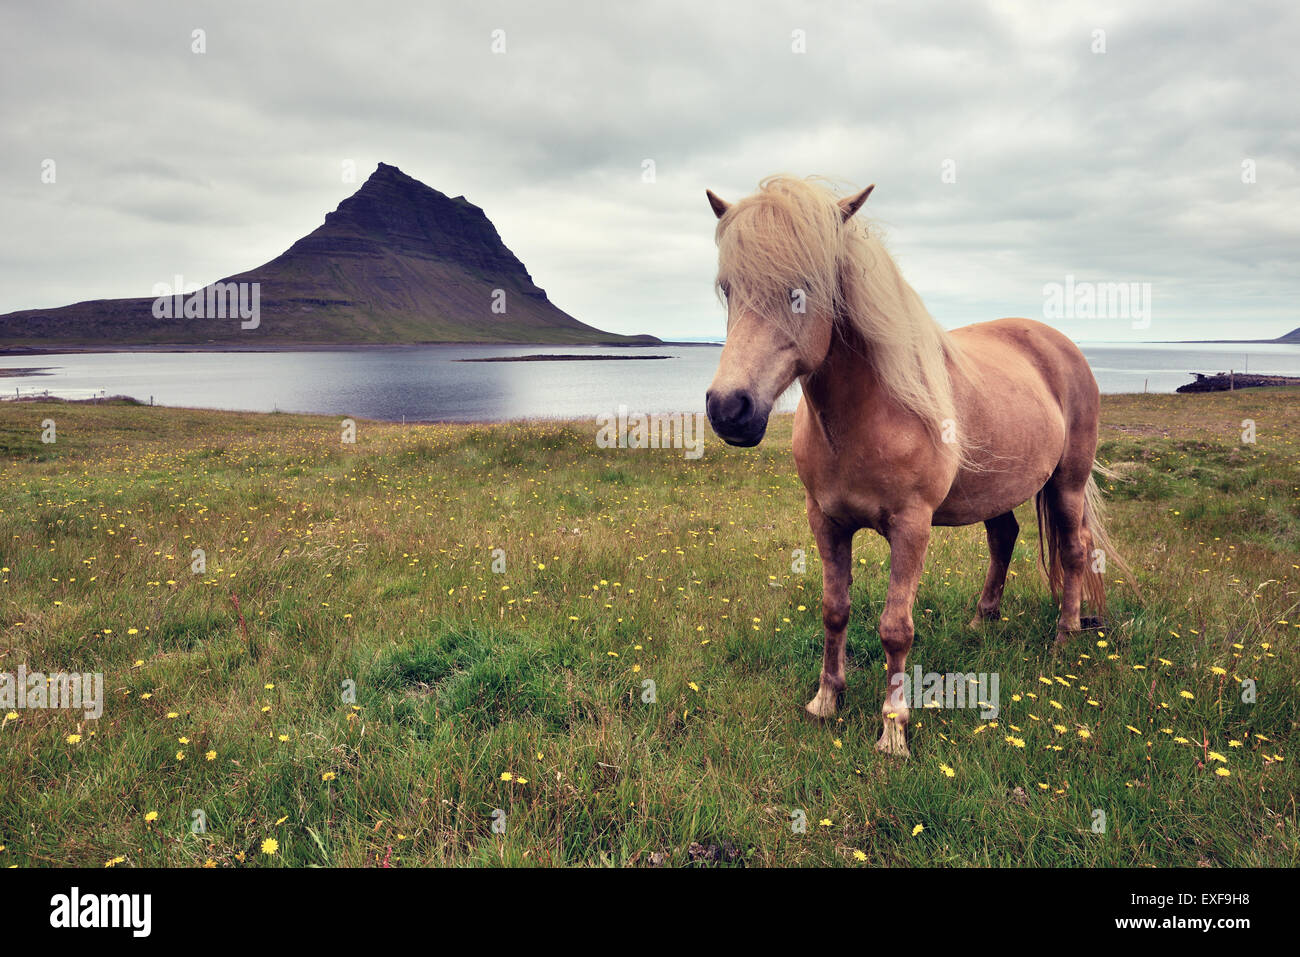 Cheval islandais, Péninsule de Snæfellsnes, l'Islande Banque D'Images